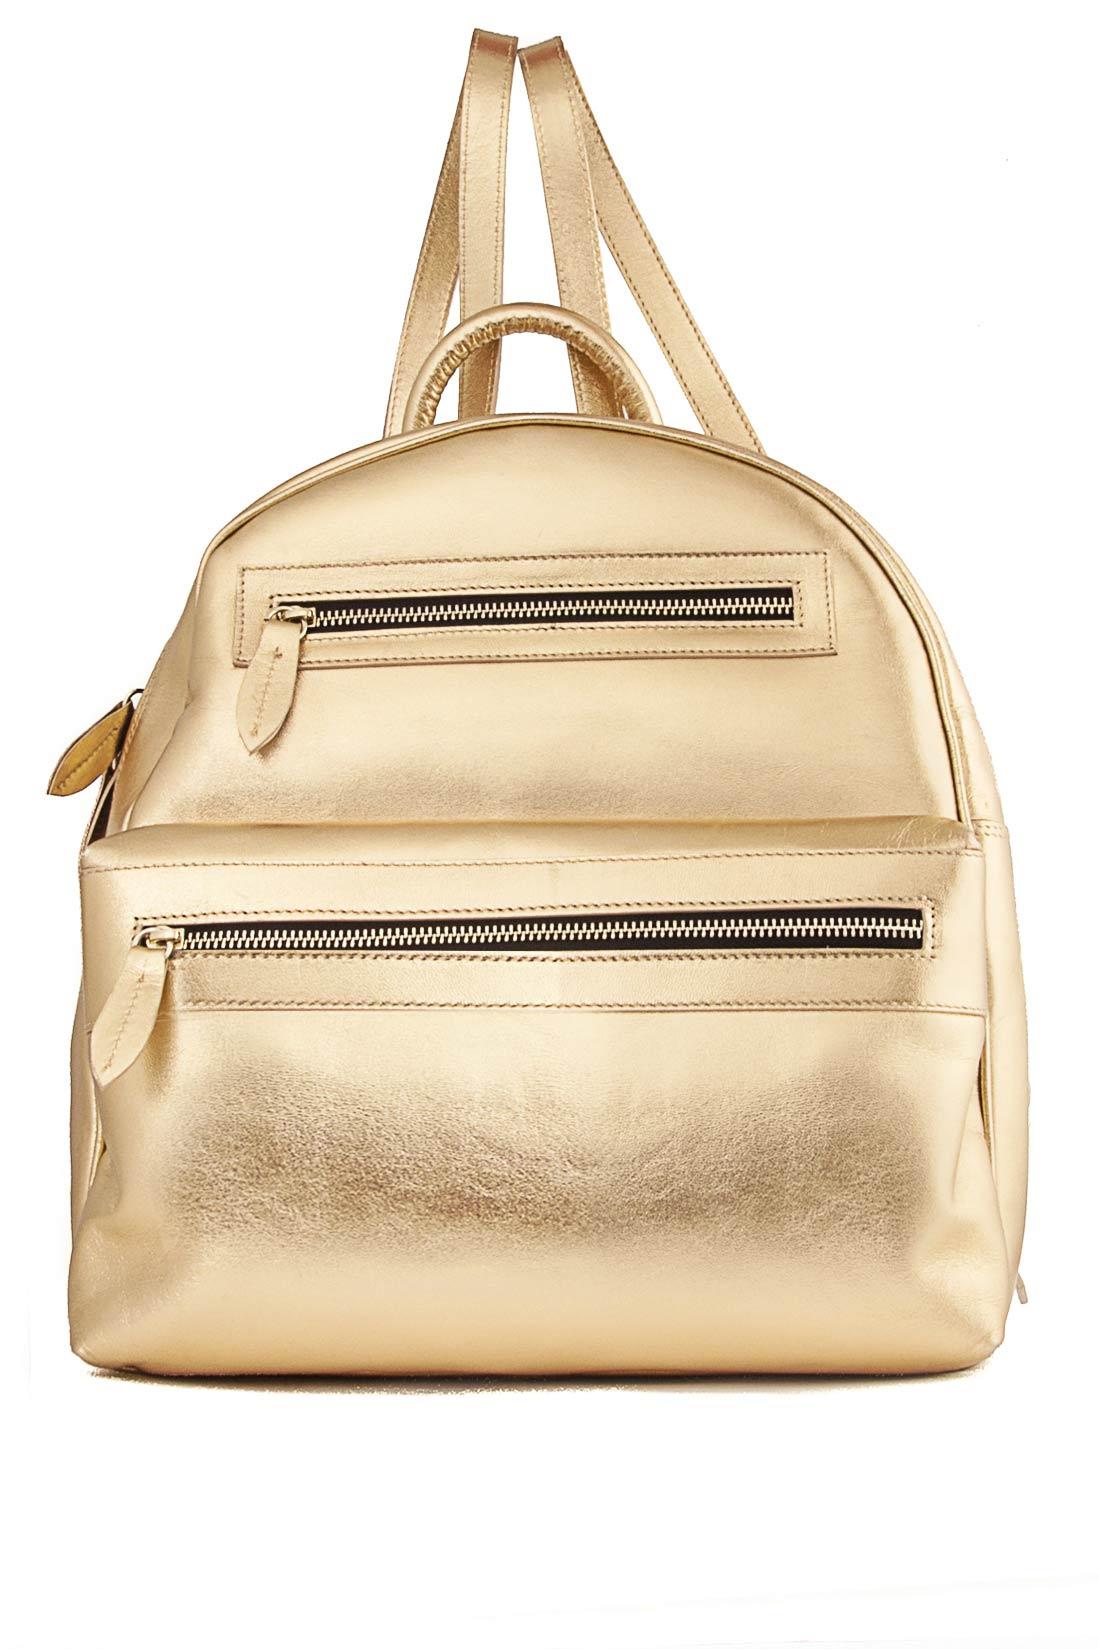 Metallic leather backpack Laura Olaru image 0